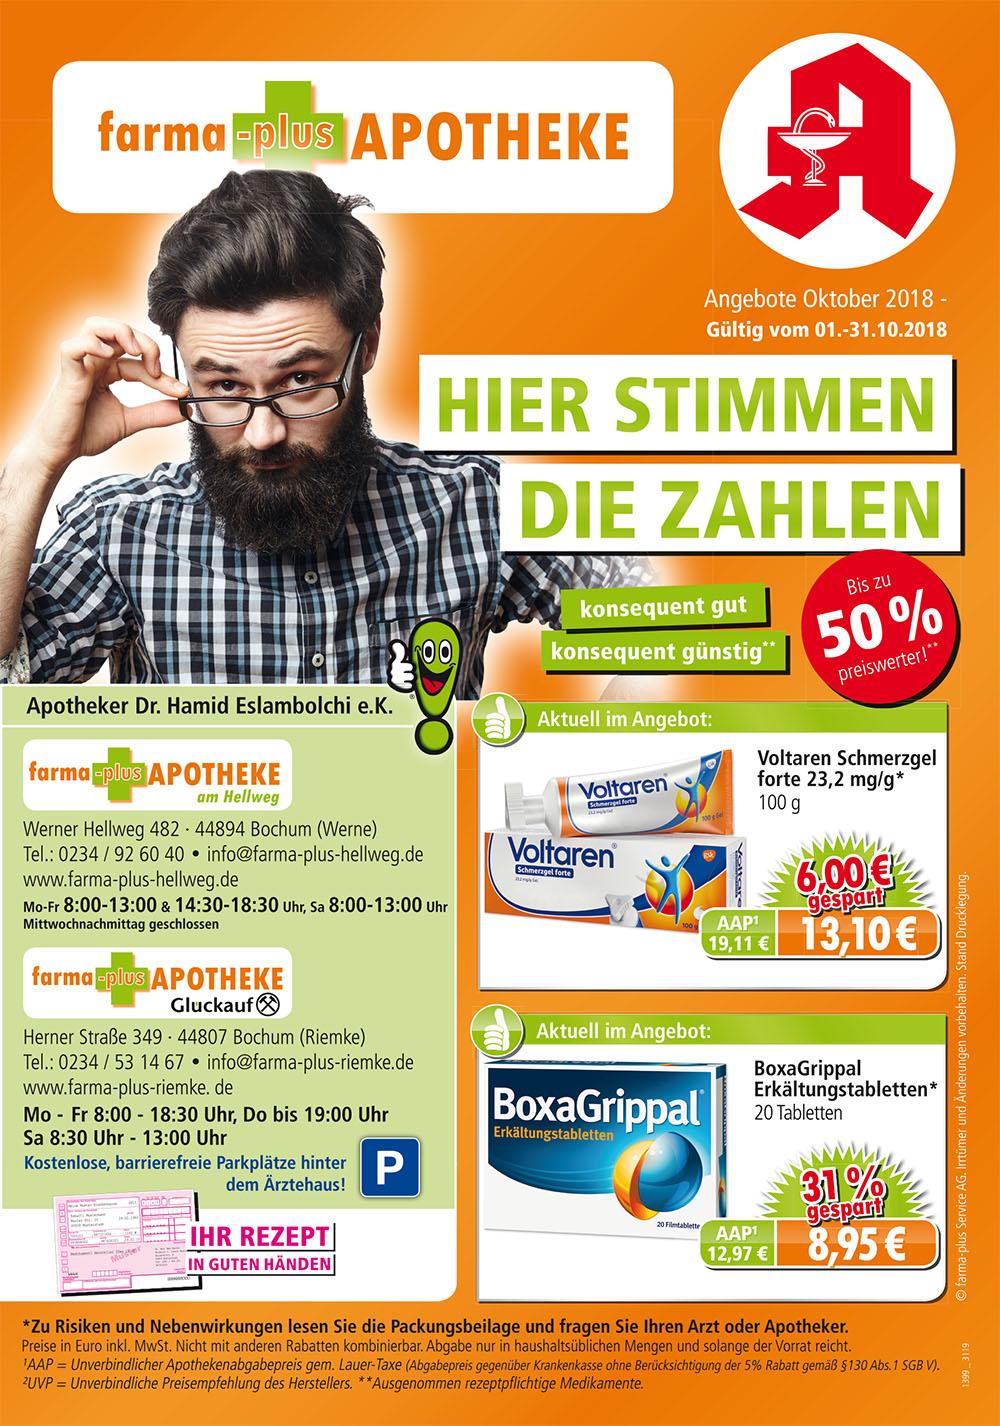 http://www.apotheken.de/fileadmin/clubarea/00000-Angebote/44807_16640_glueckauf_angebot_5.jpg